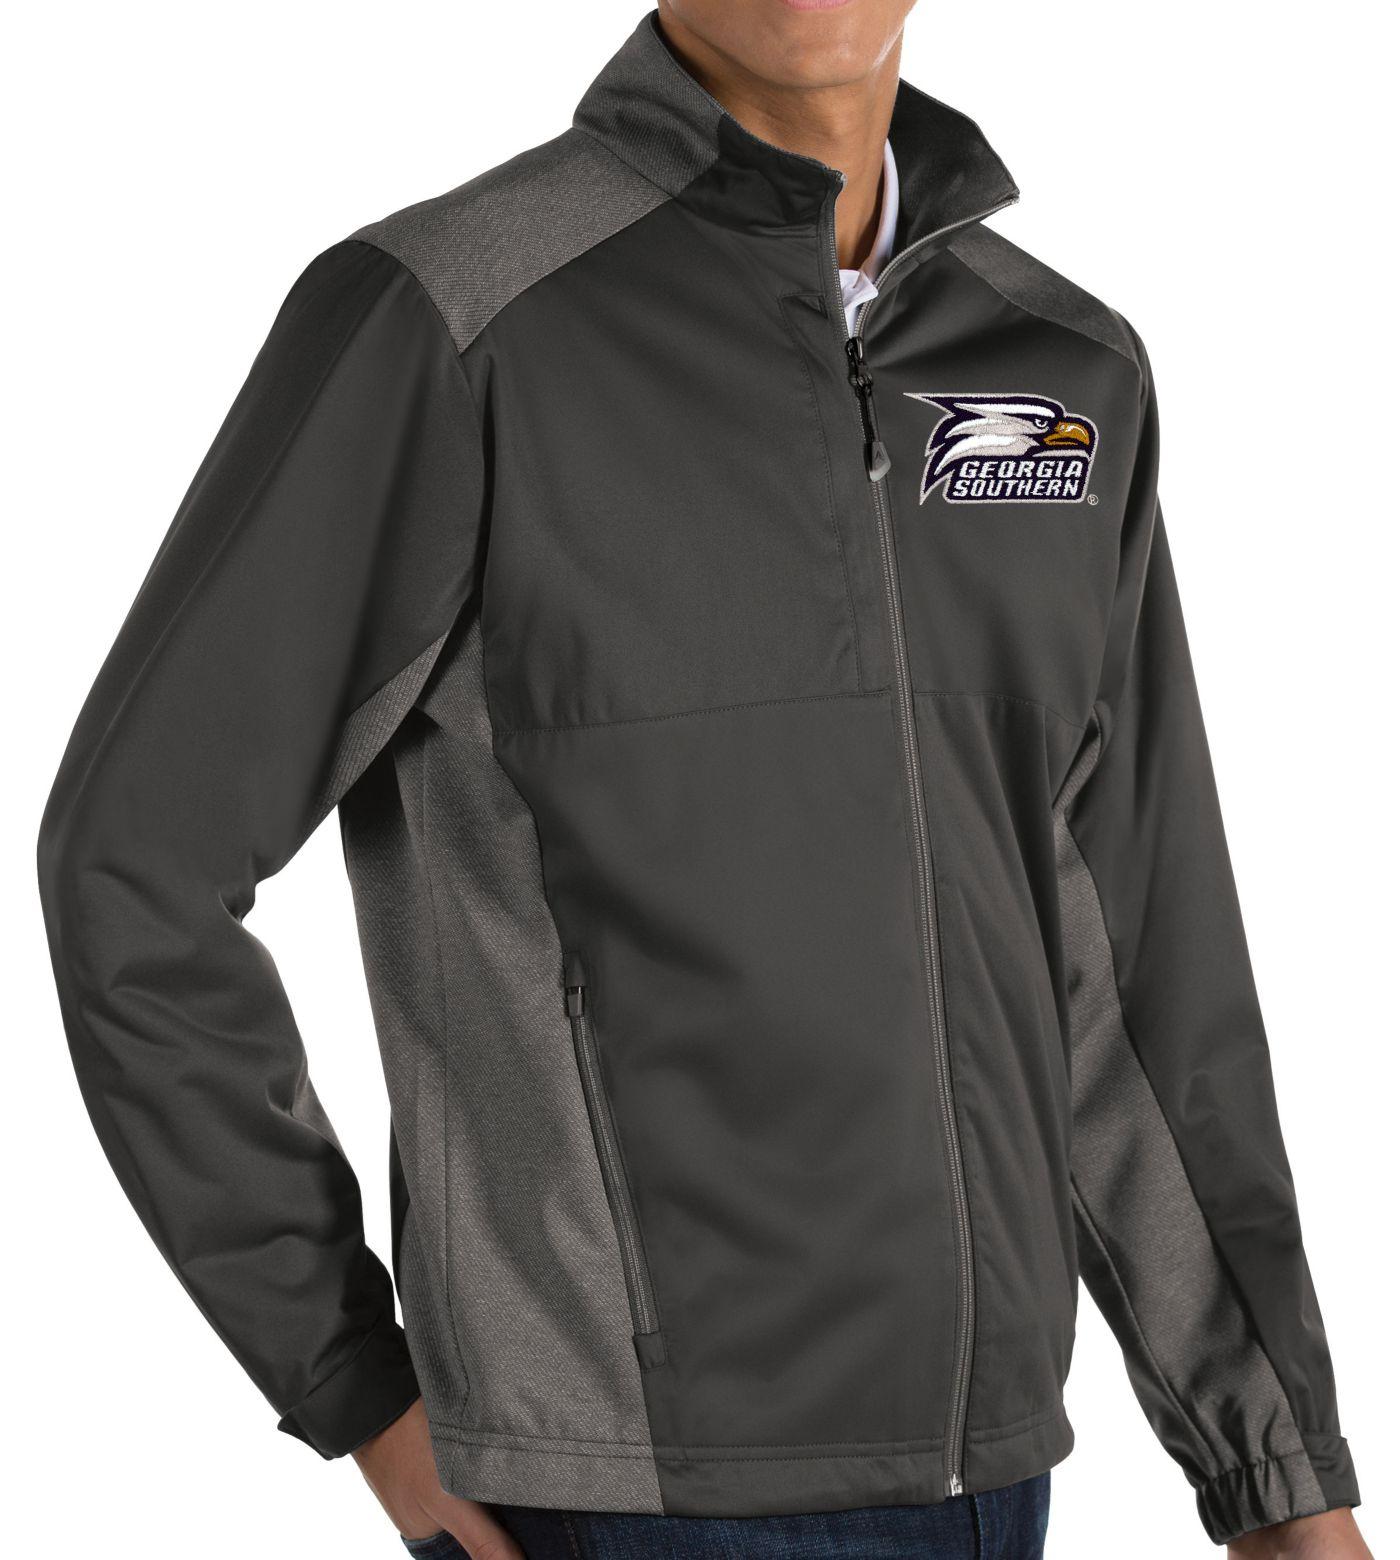 Antigua Men's Georgia Southern Eagles Grey Revolve Full-Zip Jacket